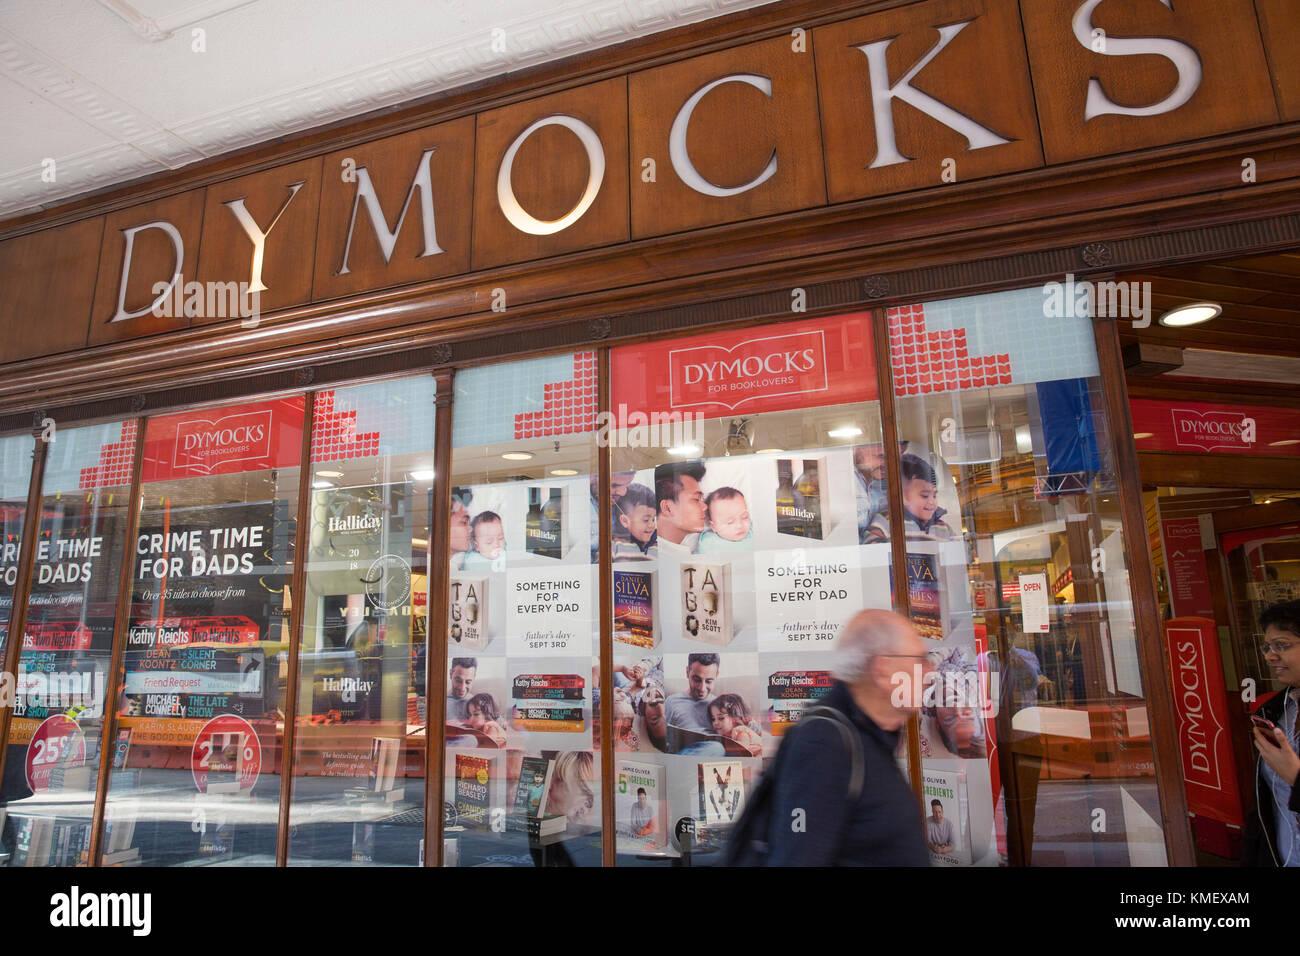 Dymocks book store bookseller in George street,Sydney,Australia - Stock Image